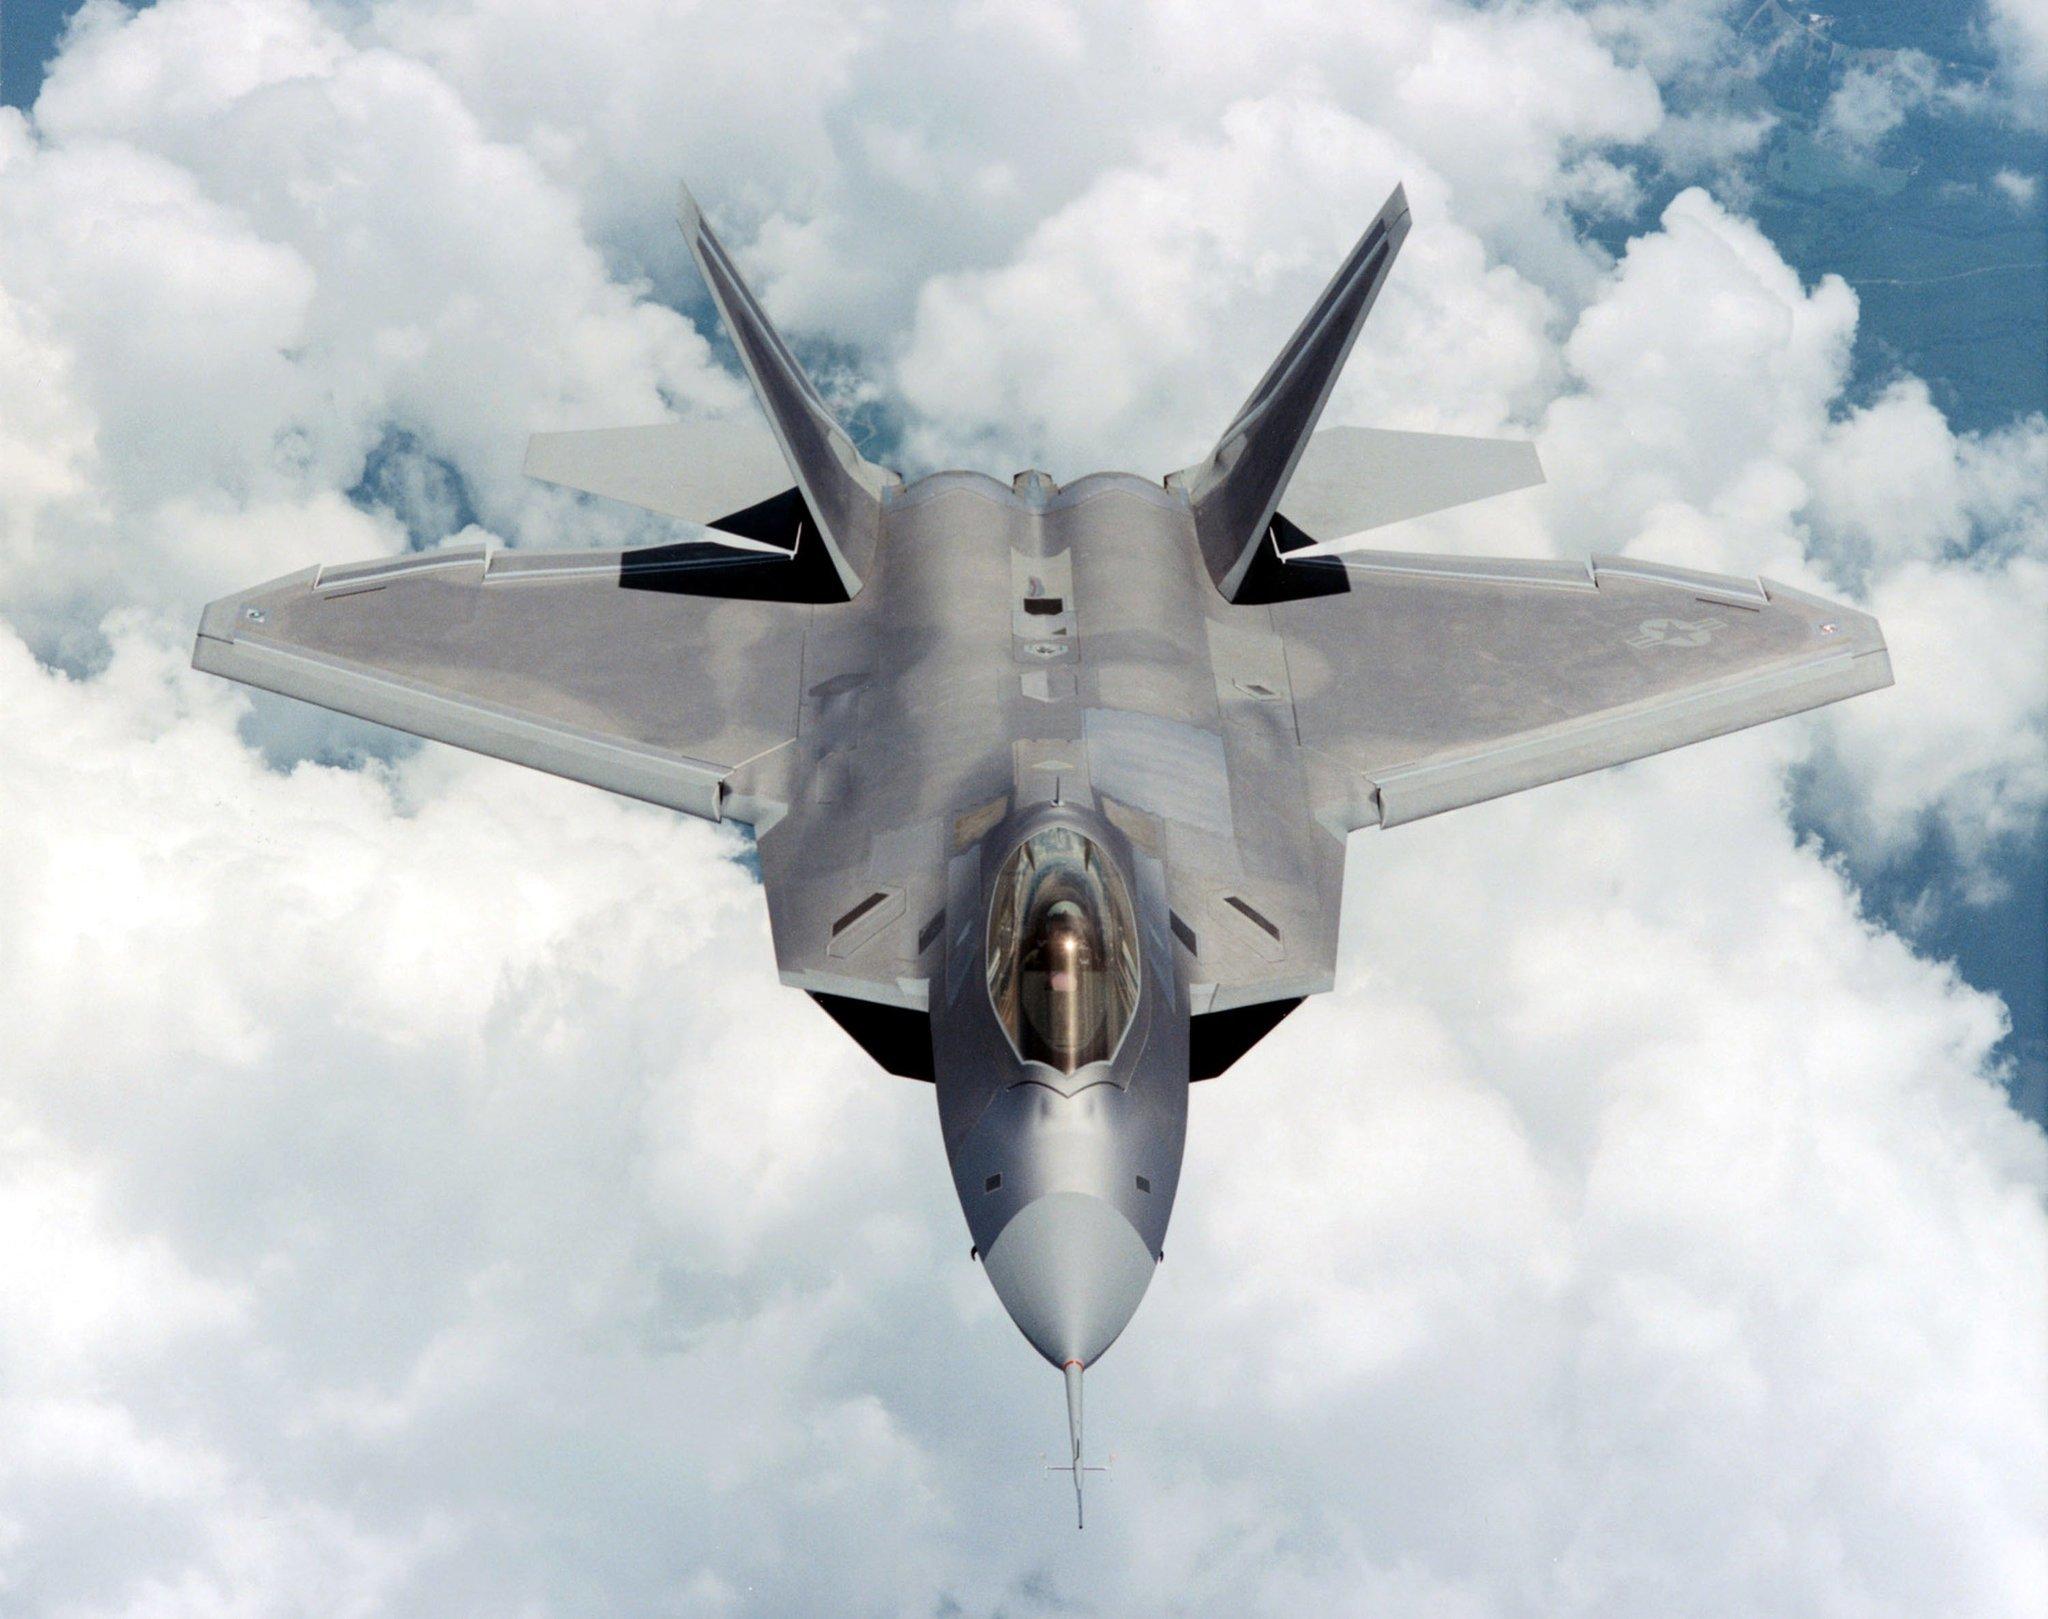 U.S. intercepts 2 Russian bombers off Alaska's coast - Chicago Tribune